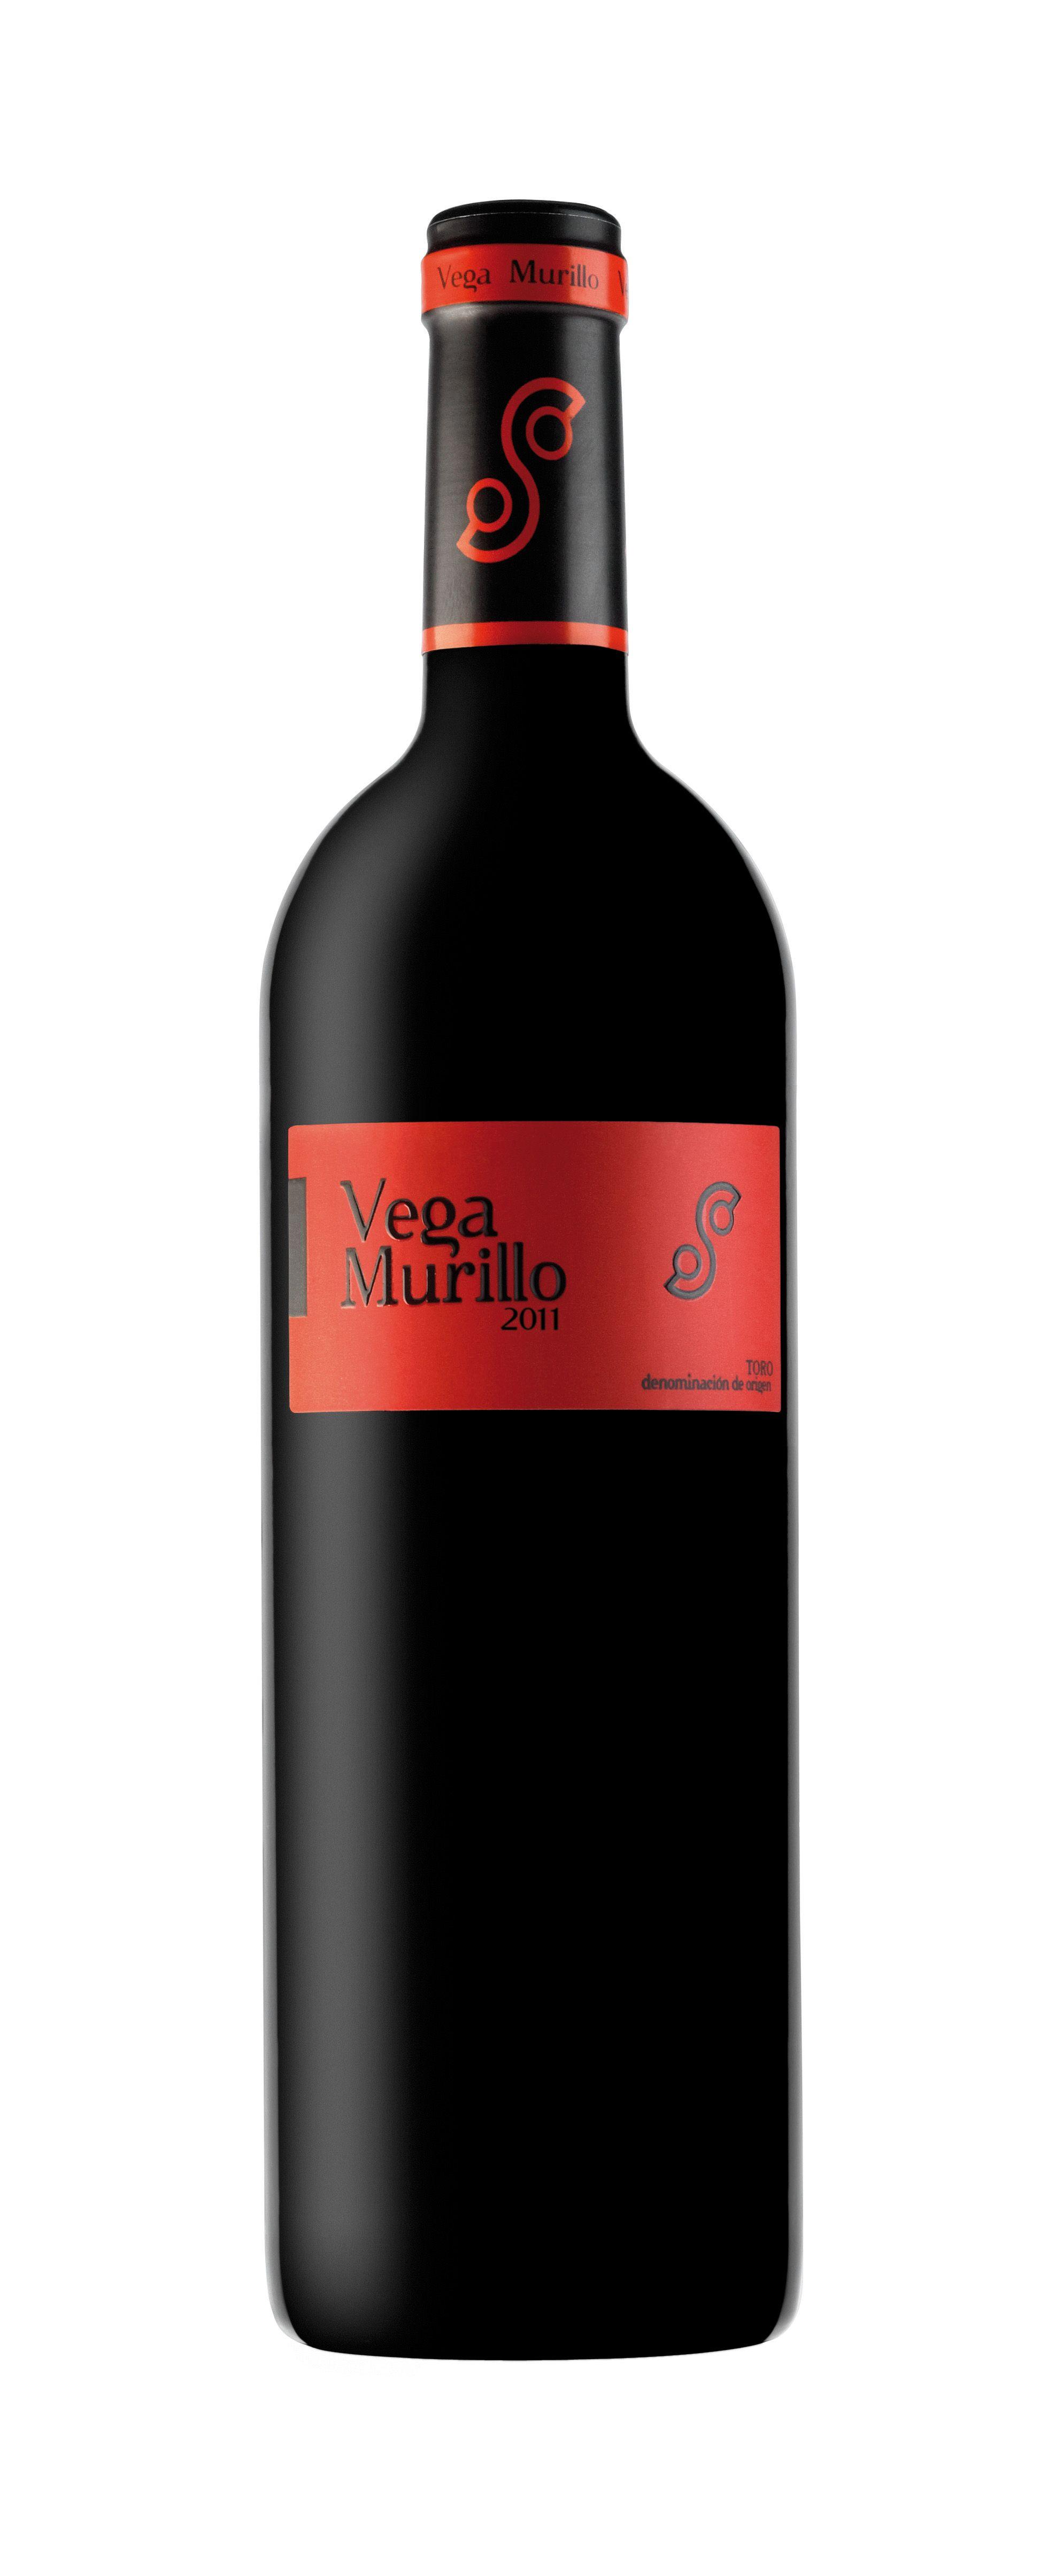 Vega Murilla A Lady S Wine Wine Bottle Spanish Wine Wine